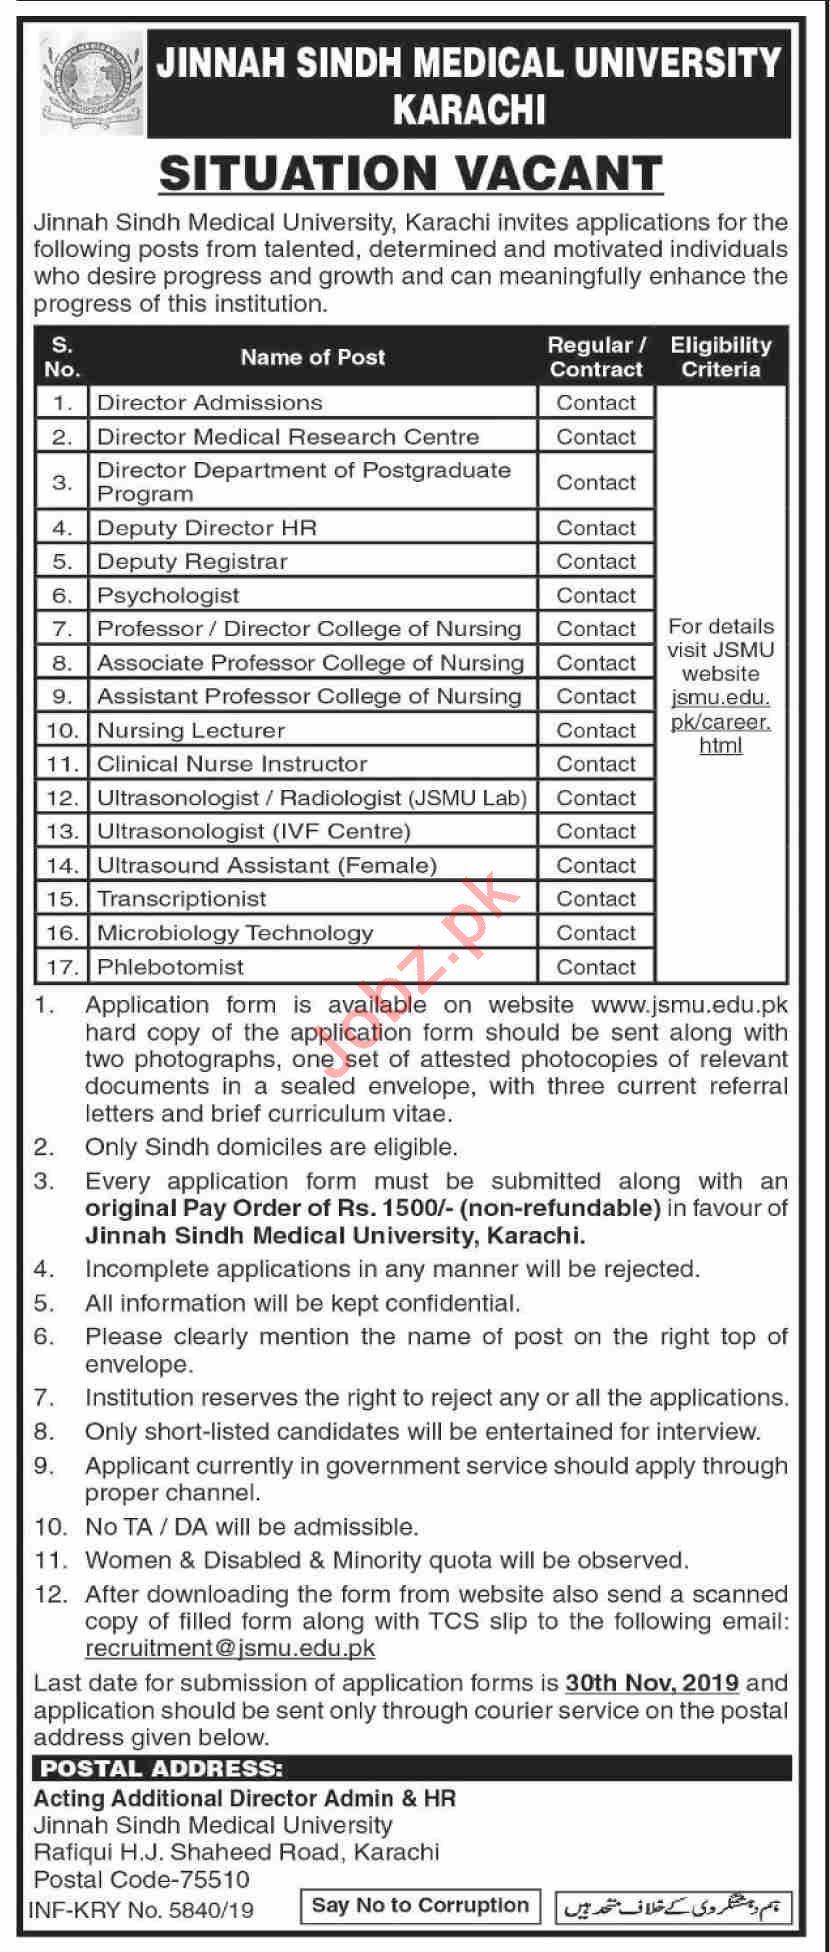 Jinnah Sindh Medical University JSMU Karachi Jobs 2019